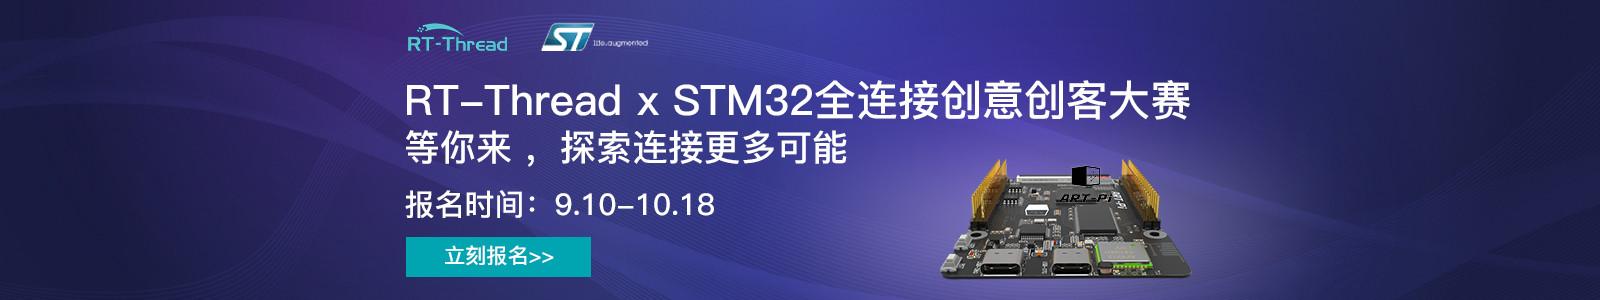 RT-Thread x STM32 全连接创意创客大赛